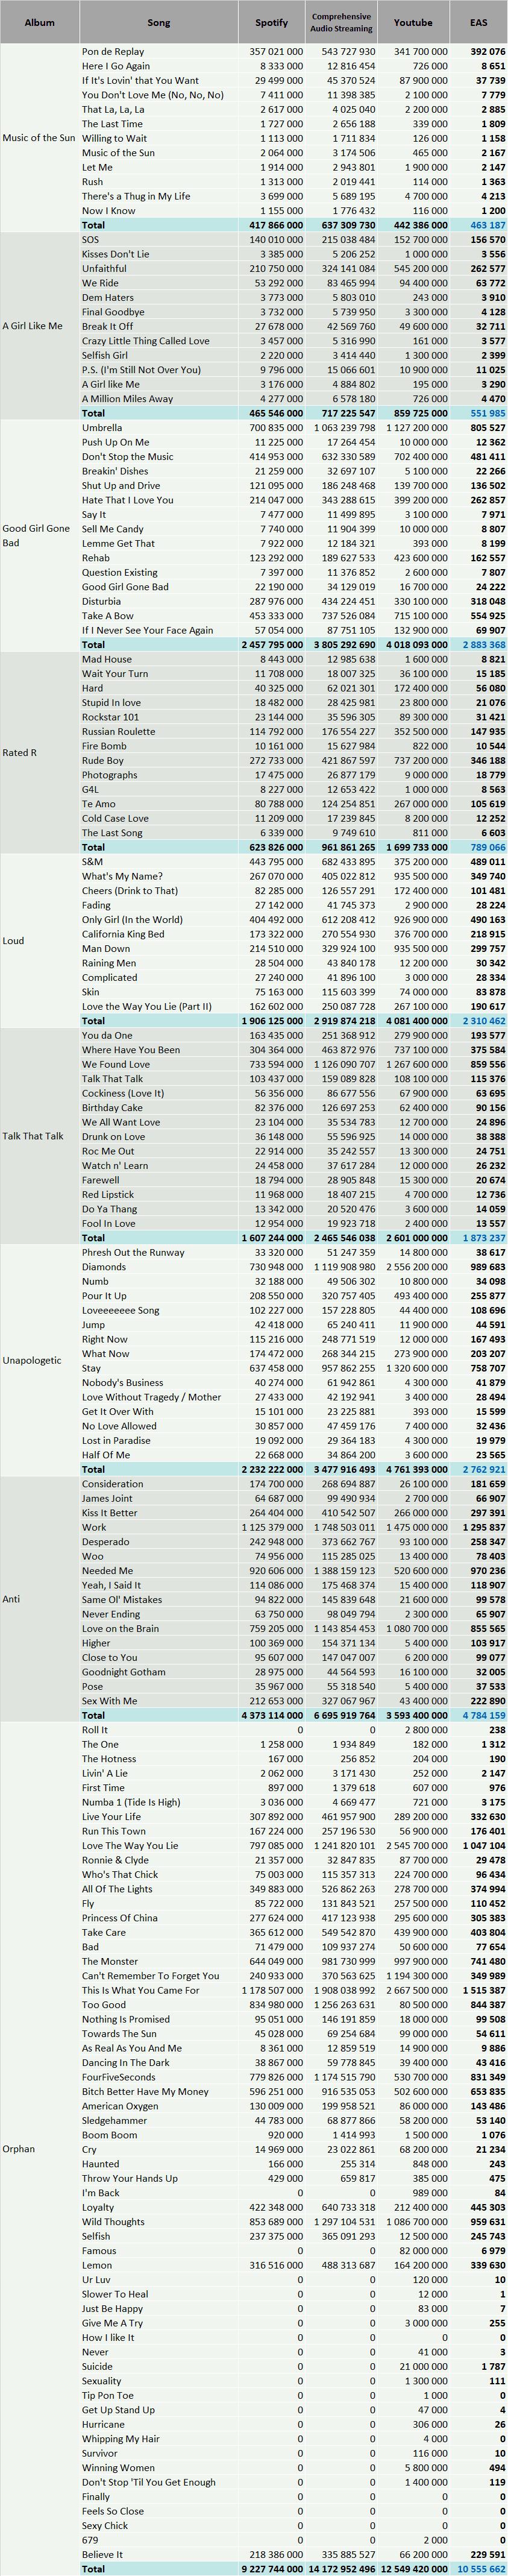 CSPC Rihanna 2021 discography streaming breakdown